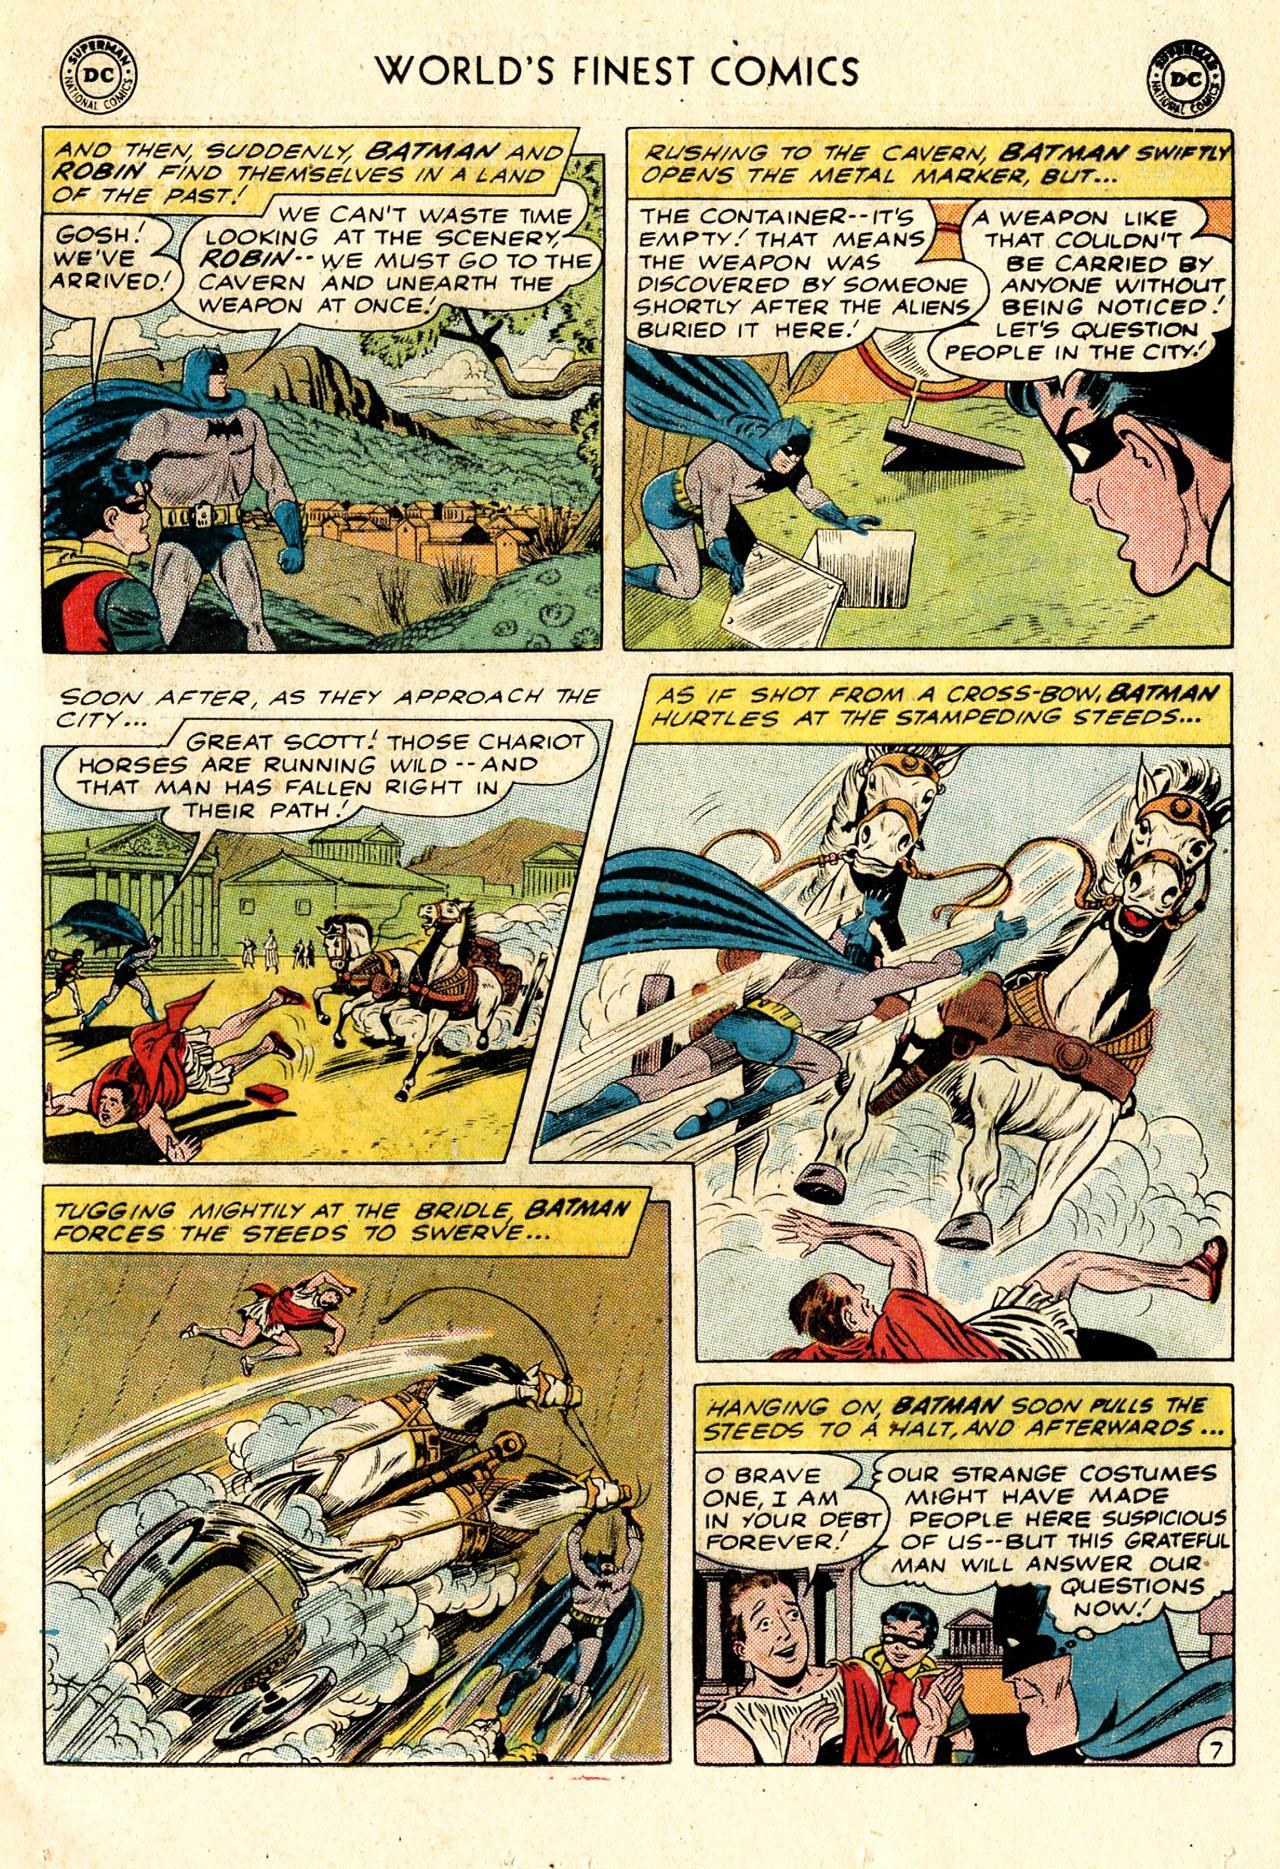 Read online World's Finest Comics comic -  Issue #107 - 9